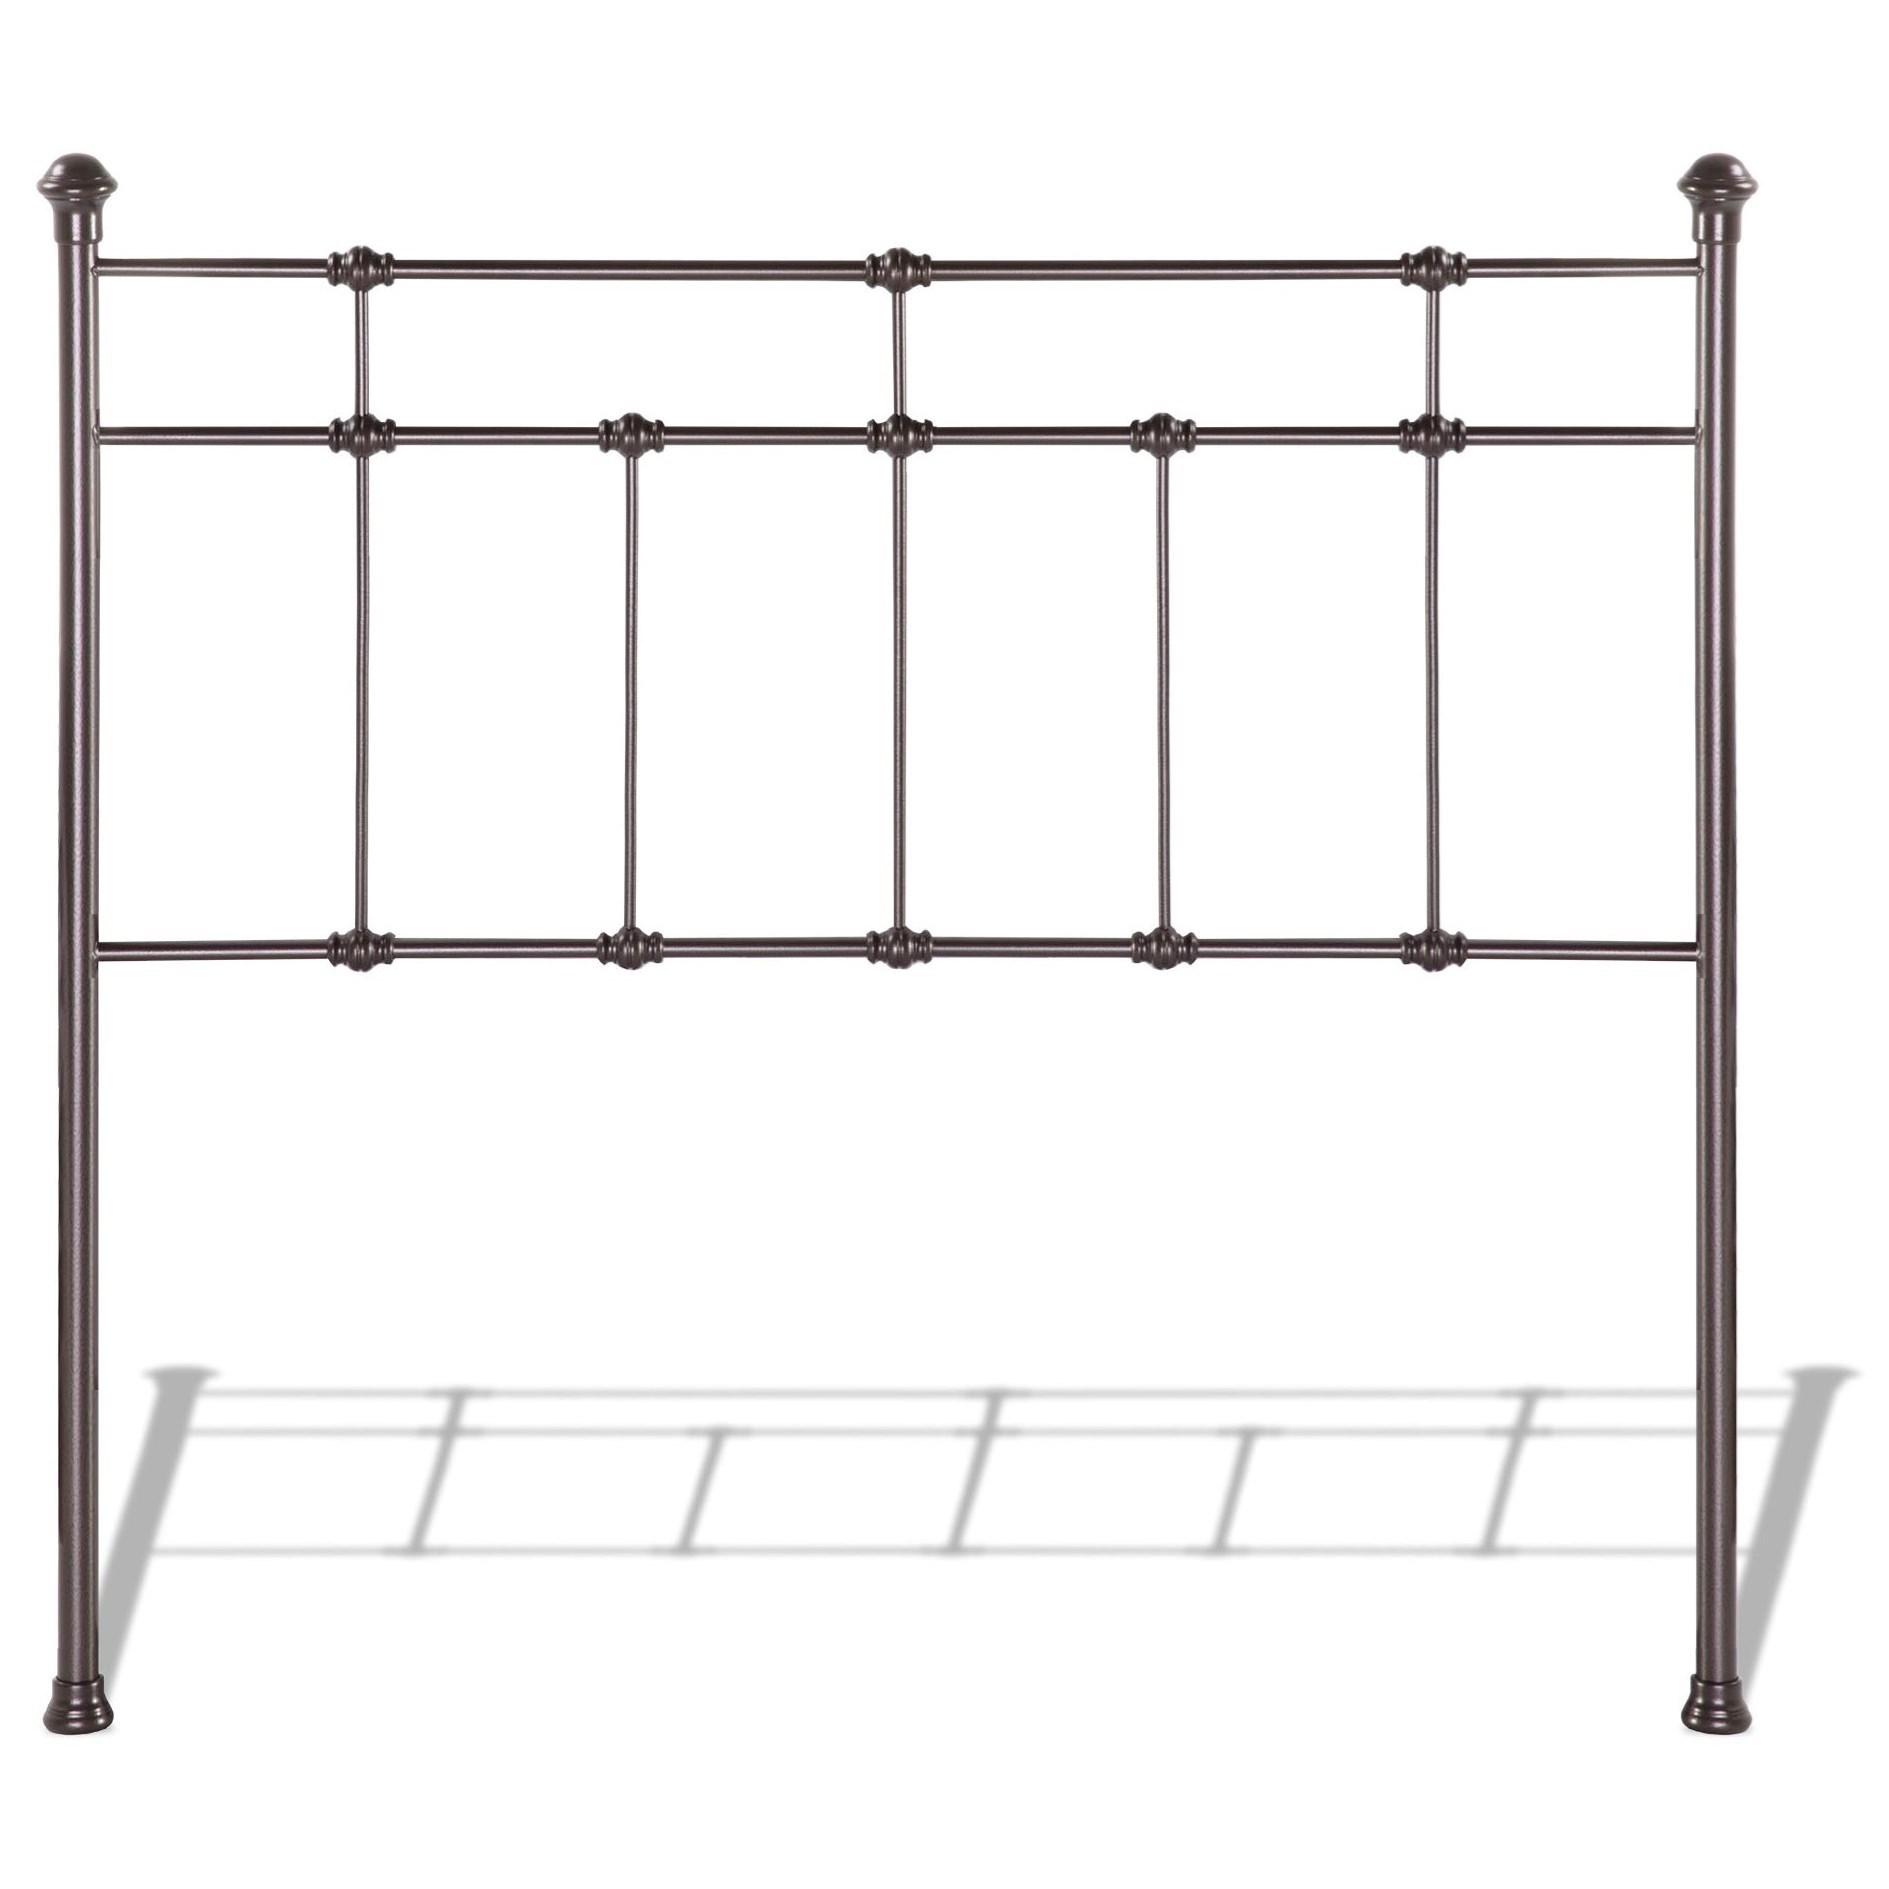 Fashion Bed Group Metal Beds Queen Dexter Headboard  - Item Number: B42145